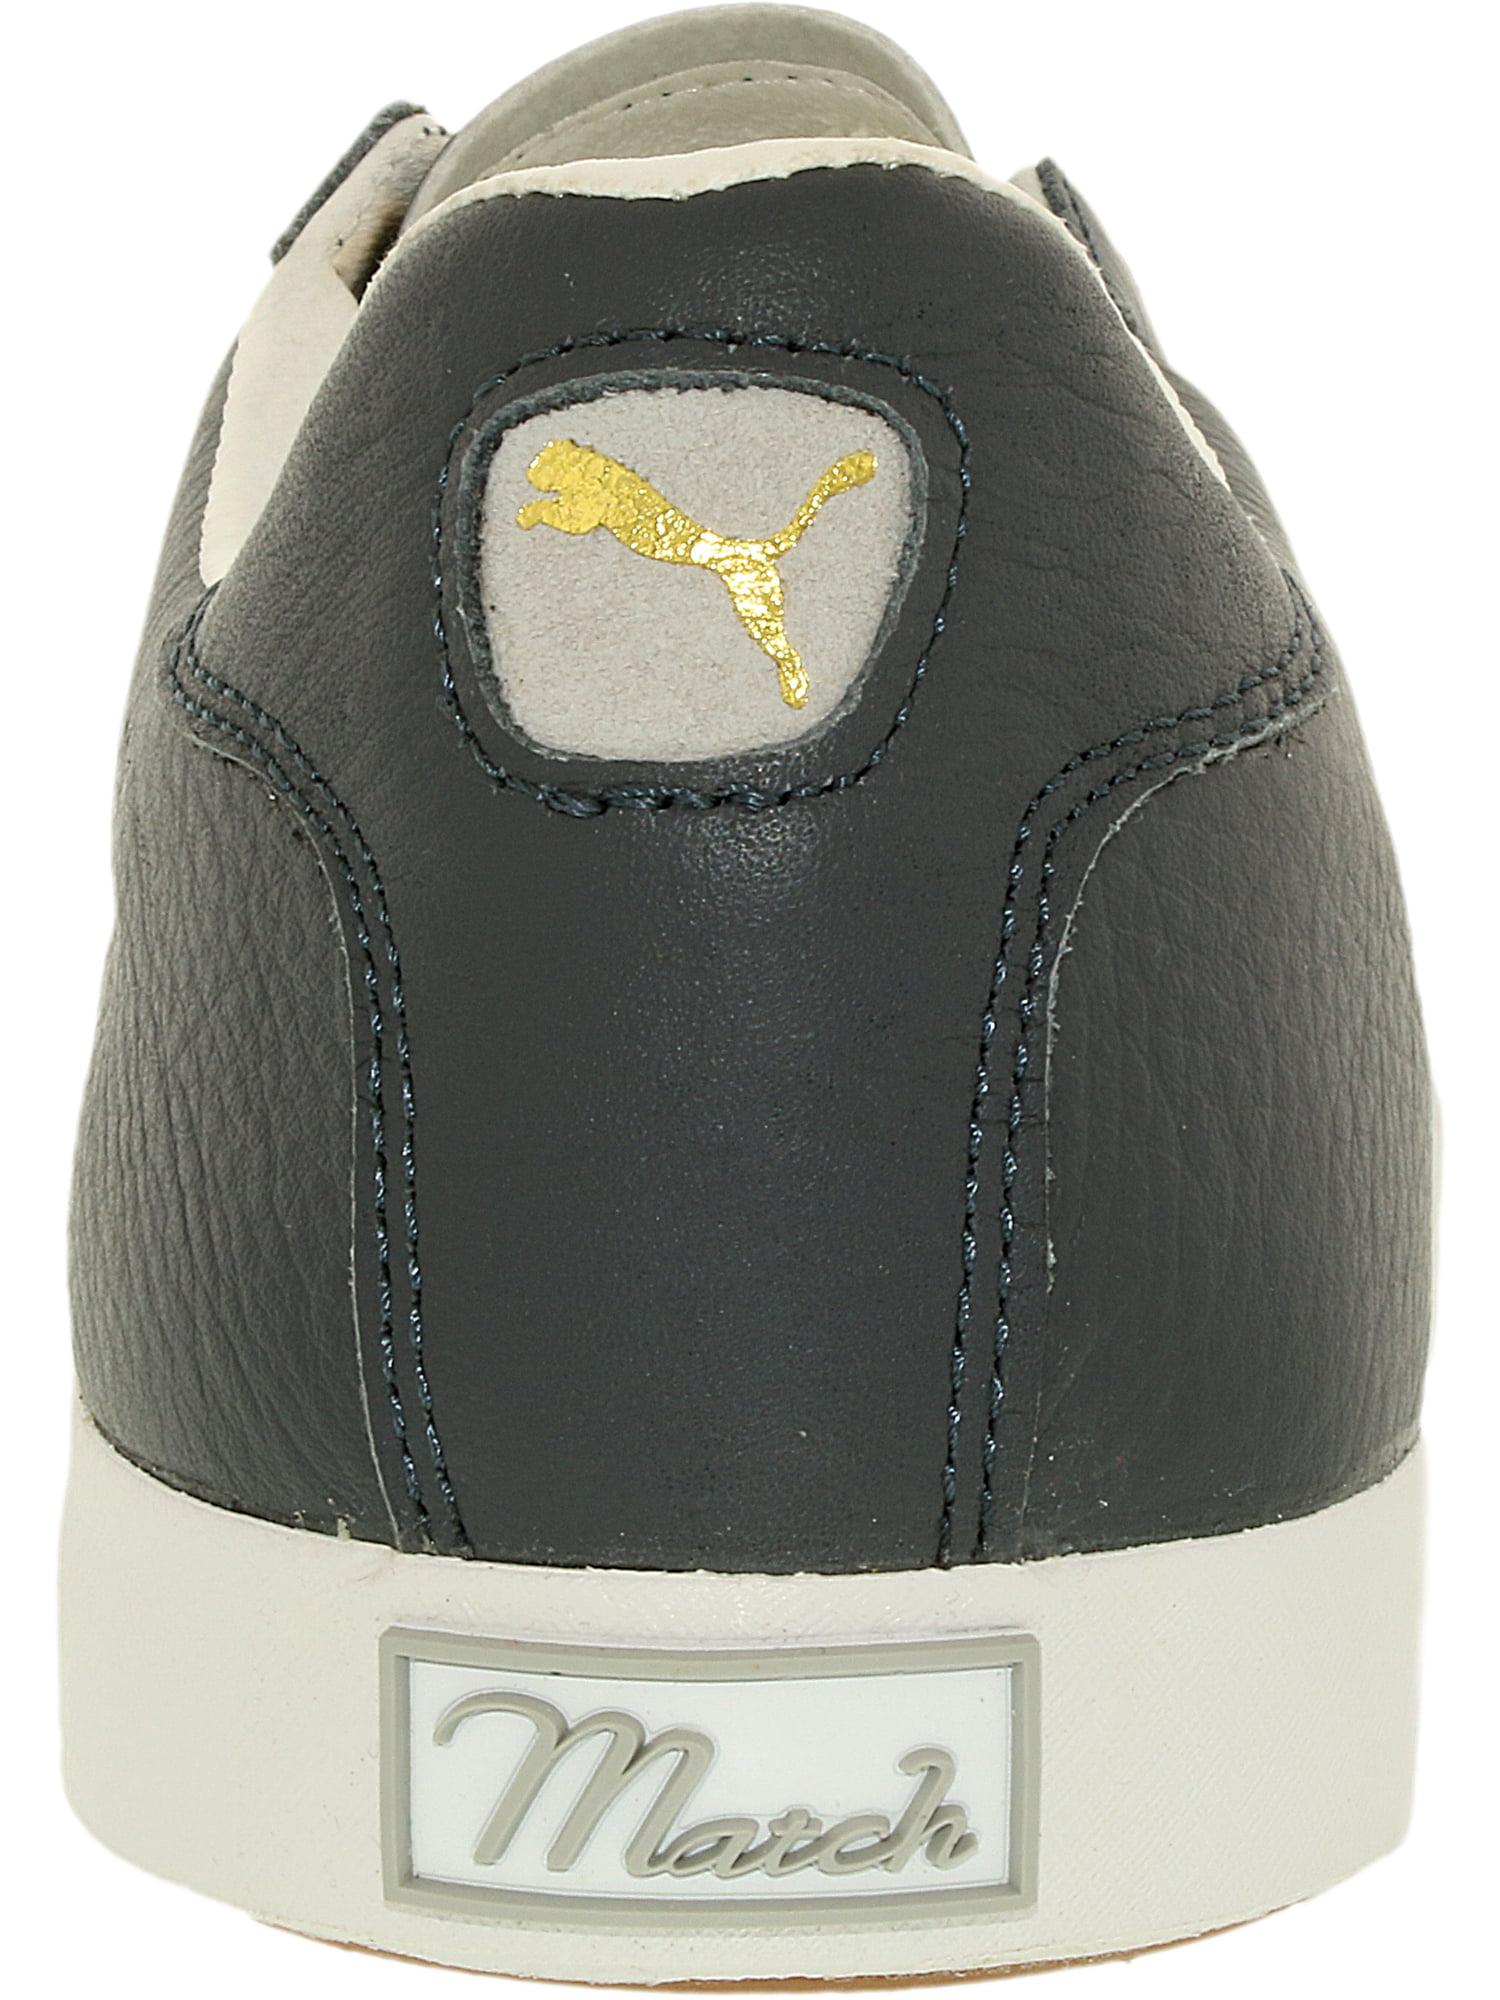 e4d5a2281882be PUMA - Puma Men s Match Vulc Turbulence Glacier Gray Ankle-High Leather  Fashion Sneaker - 10M - Walmart.com